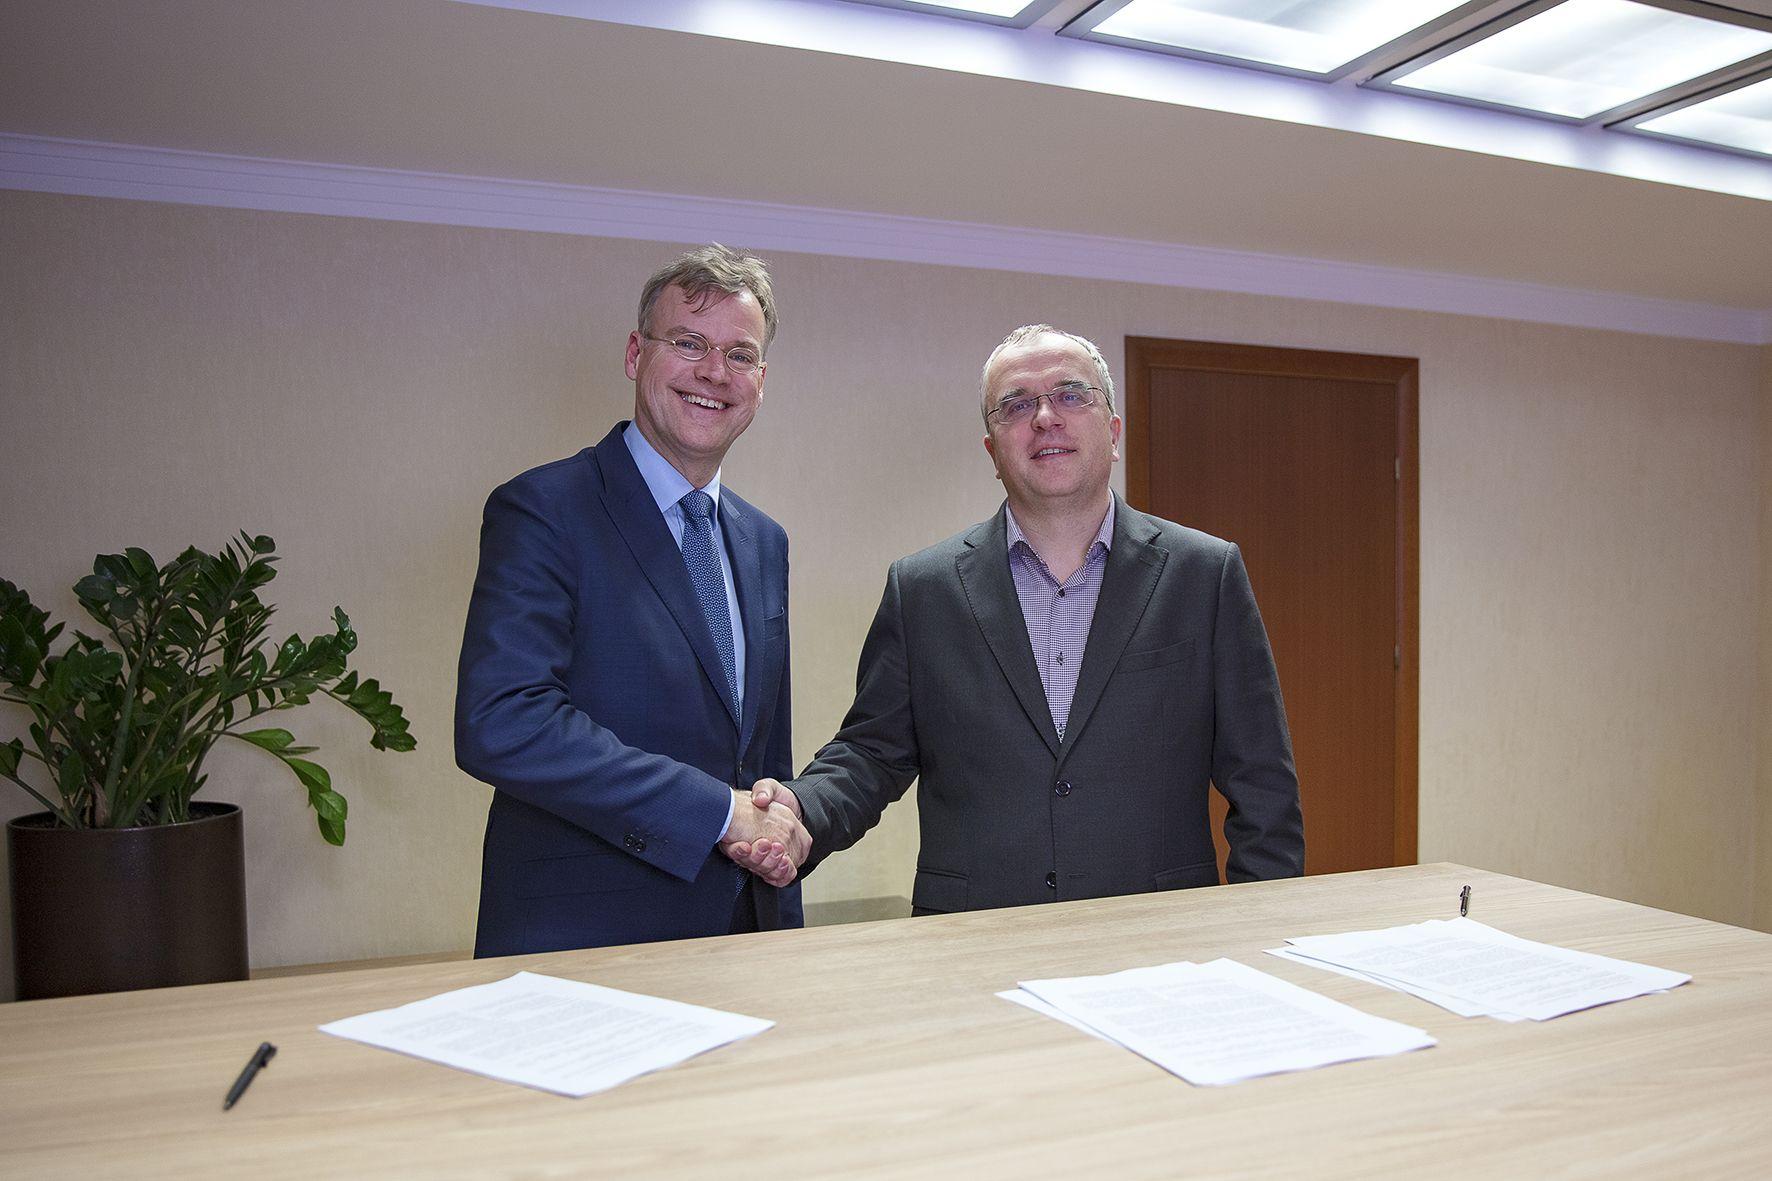 Александр Комаров (Киевстар), Ян Питер де Йонг (Microsoft Украина)